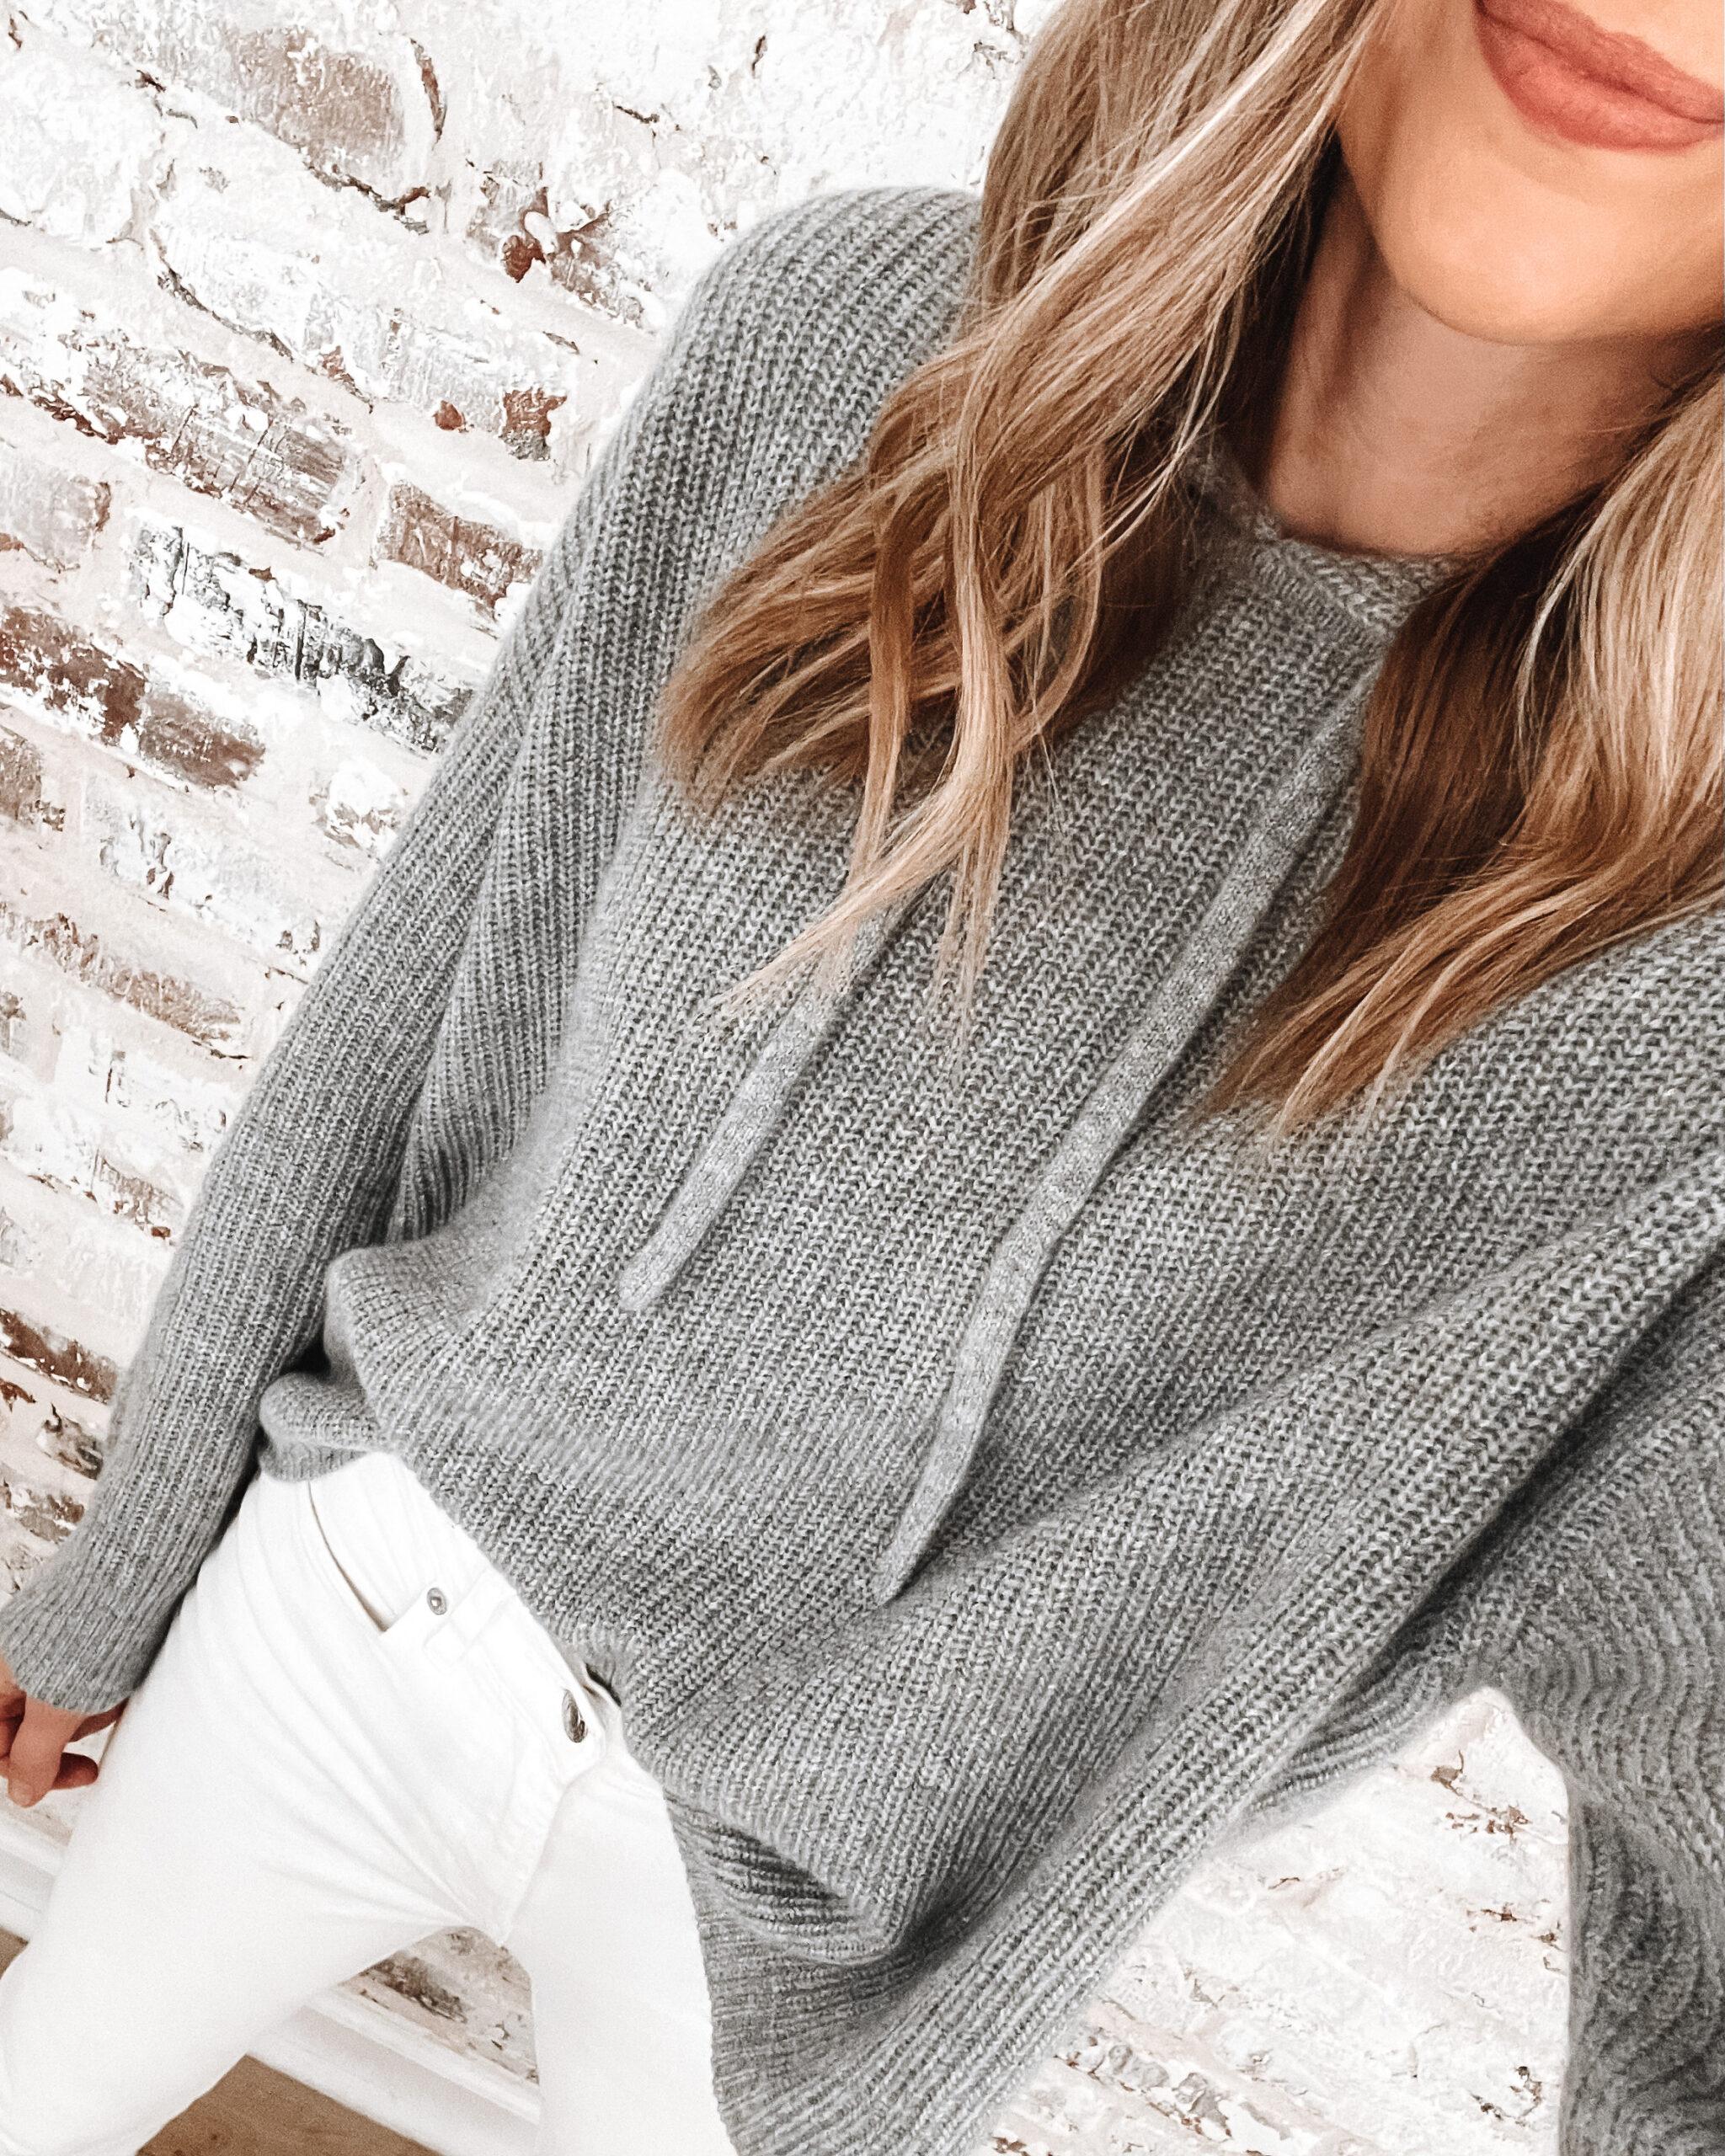 Fashion Jackson Wearing Jenni Kayne Fisherman Hoodie Sweater Grey_1